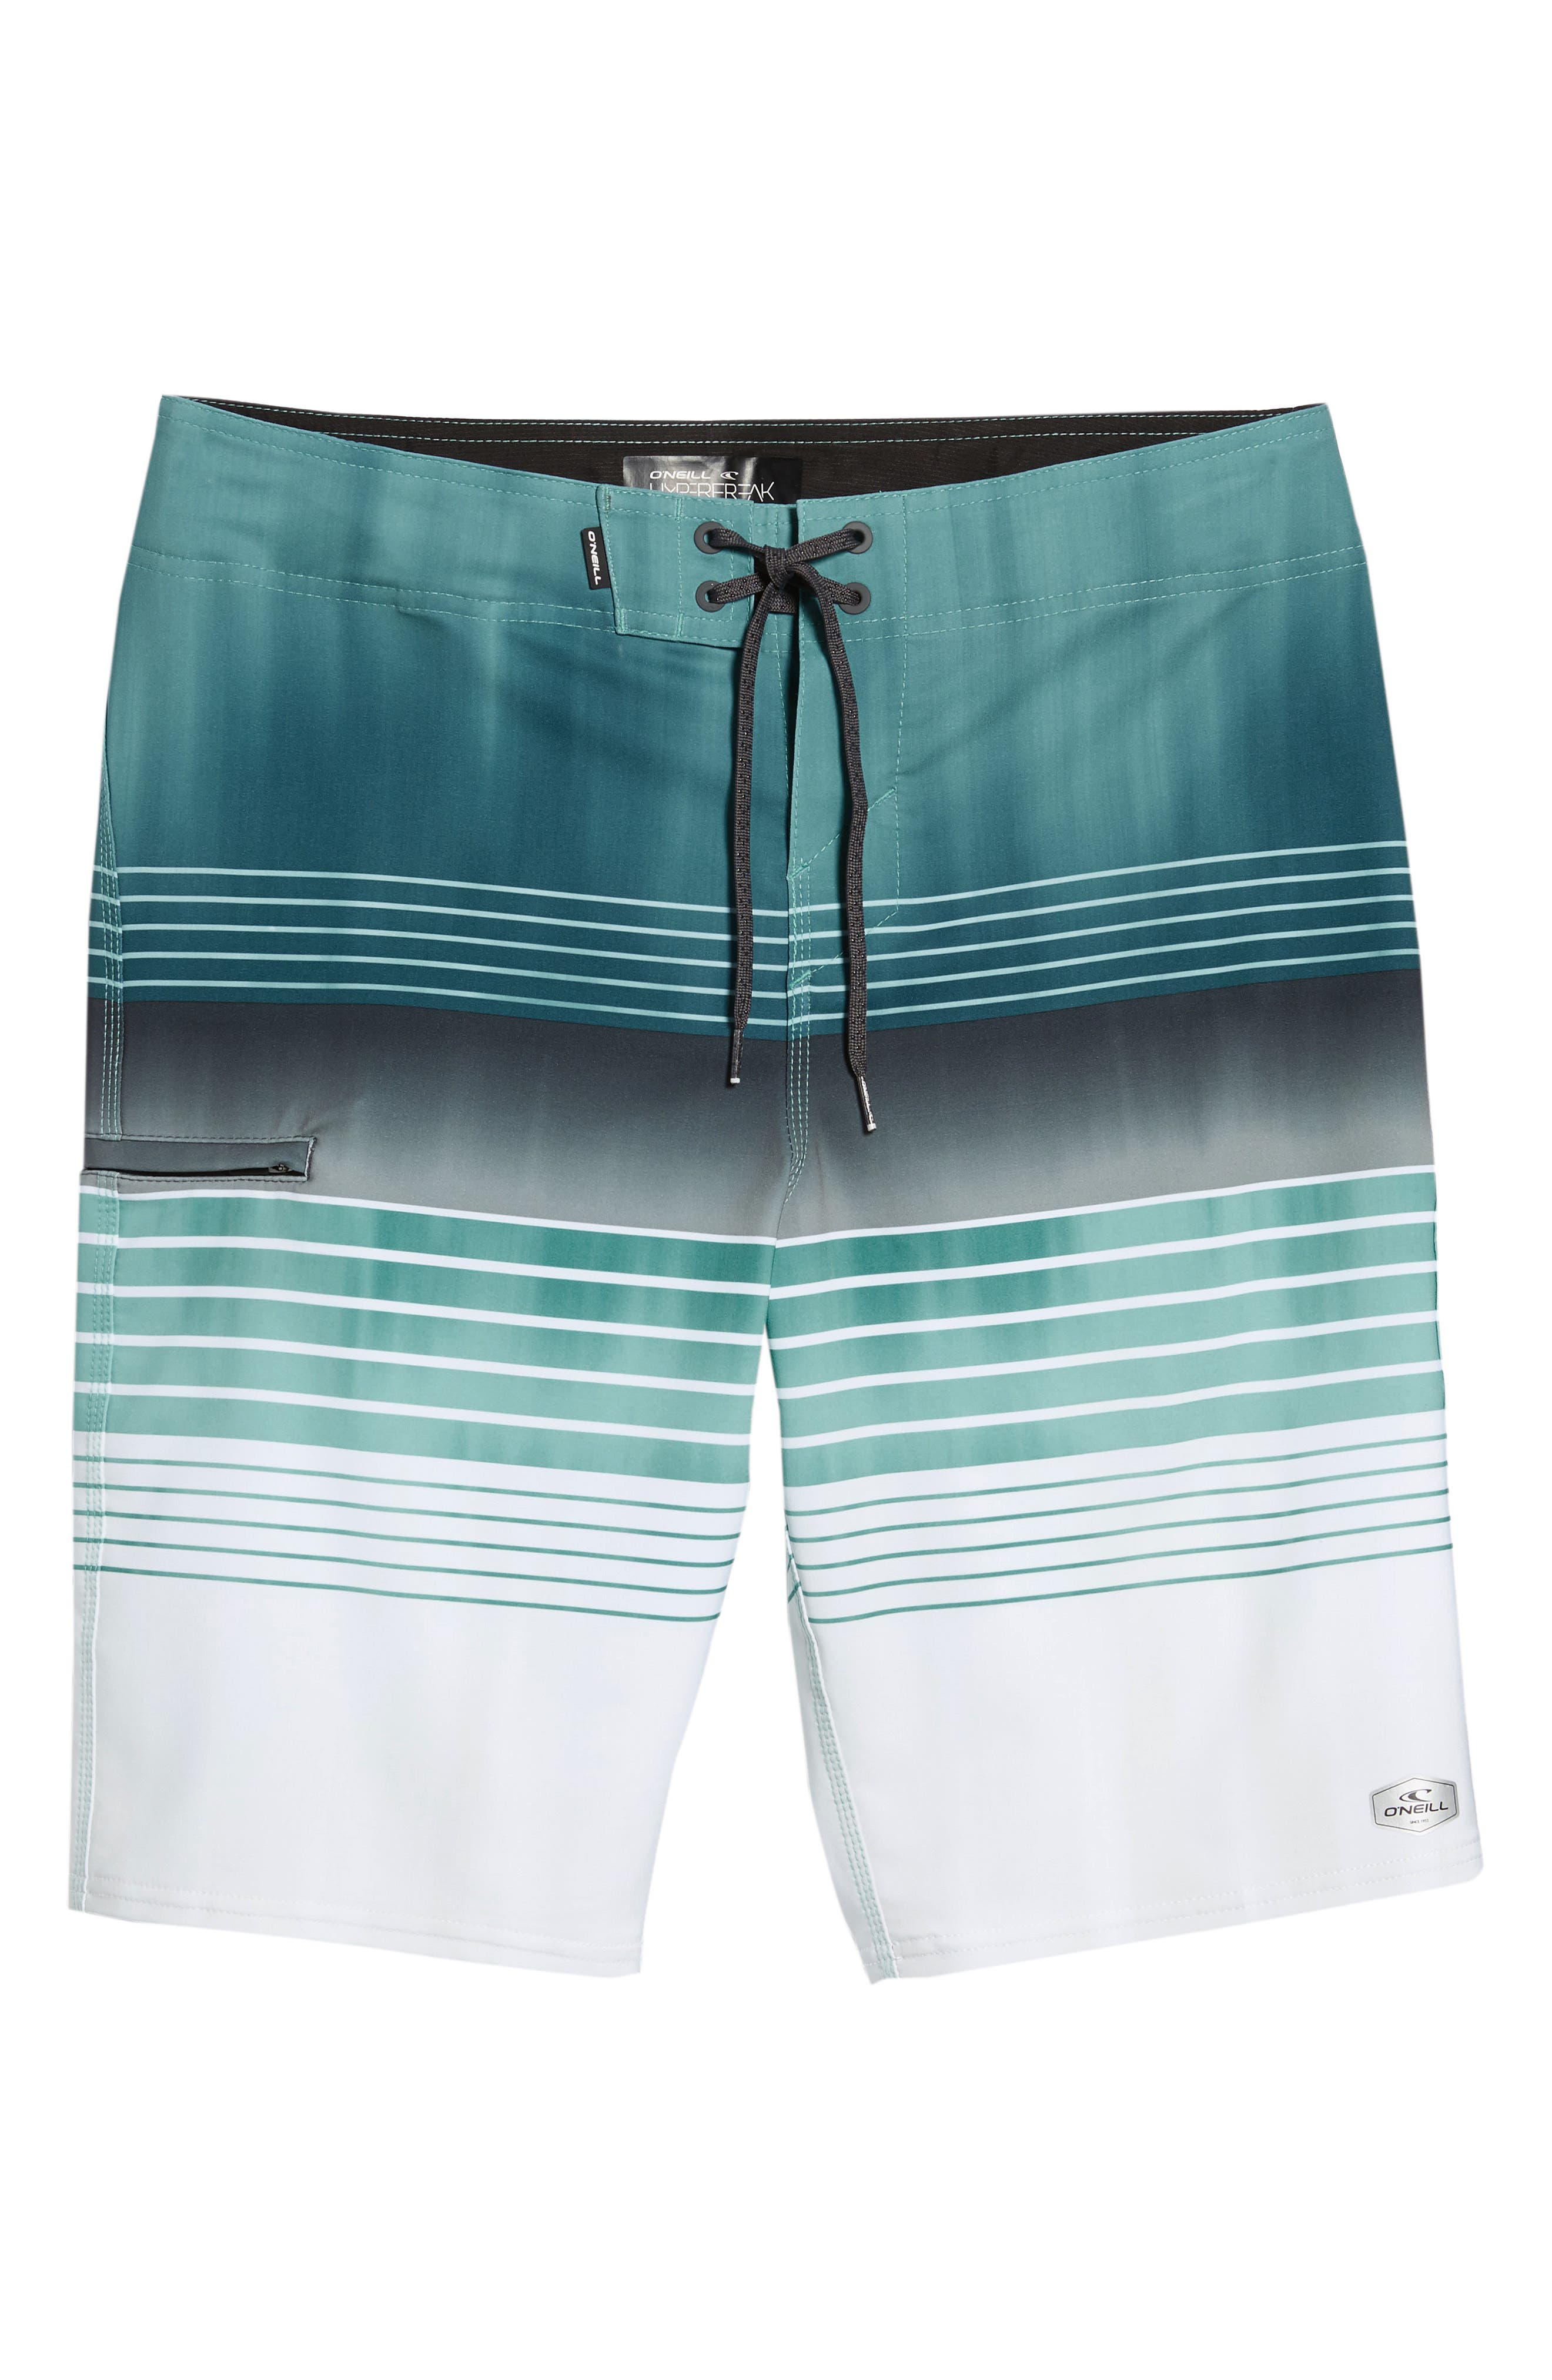 Hyperfreak Heist Board Shorts,                             Alternate thumbnail 6, color,                             Turquoise